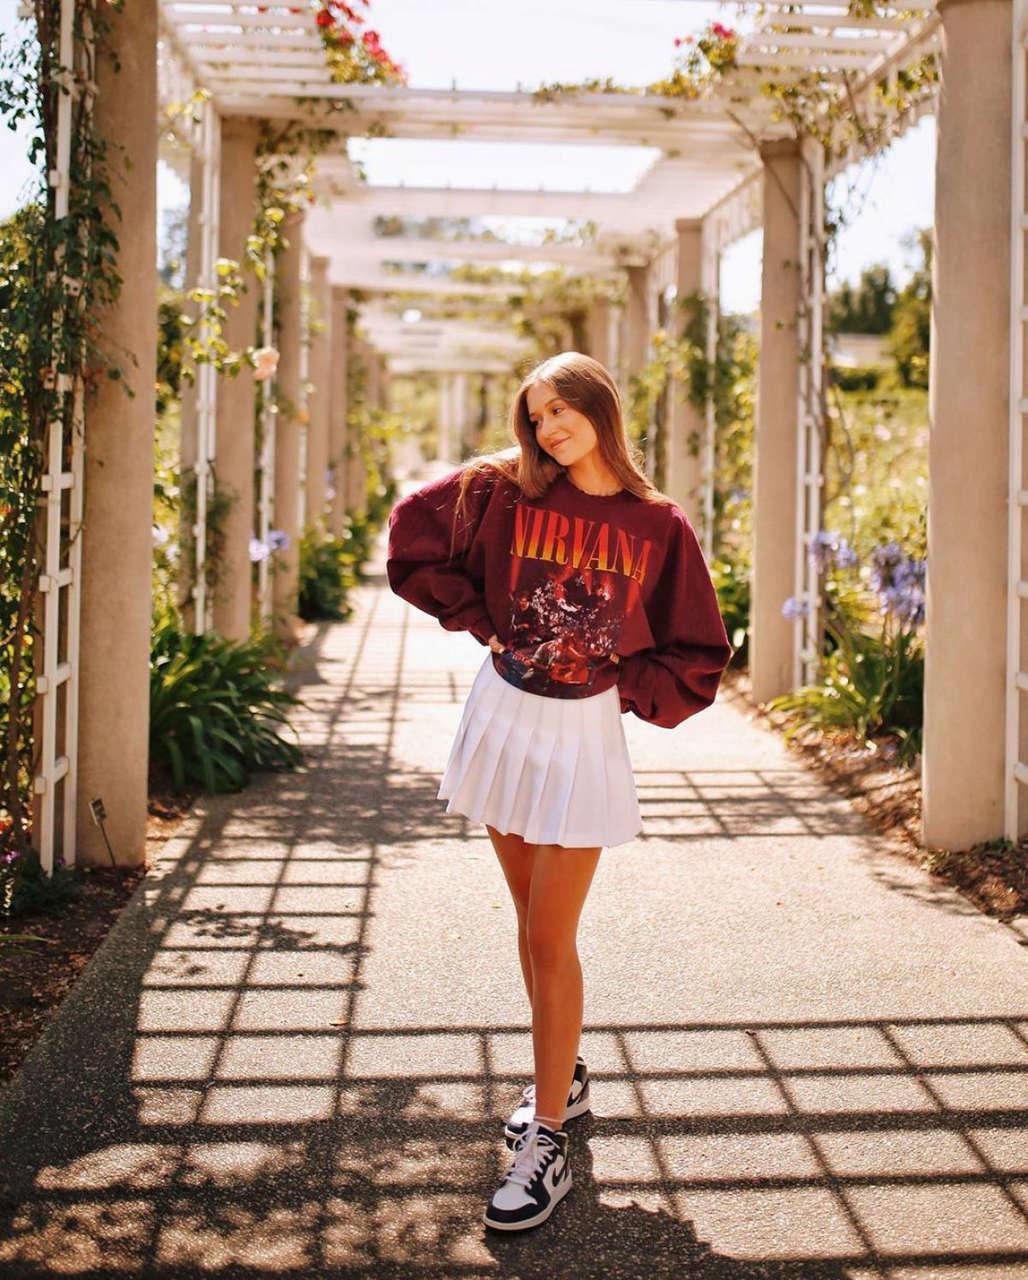 Riley Lewis Photoshoot September